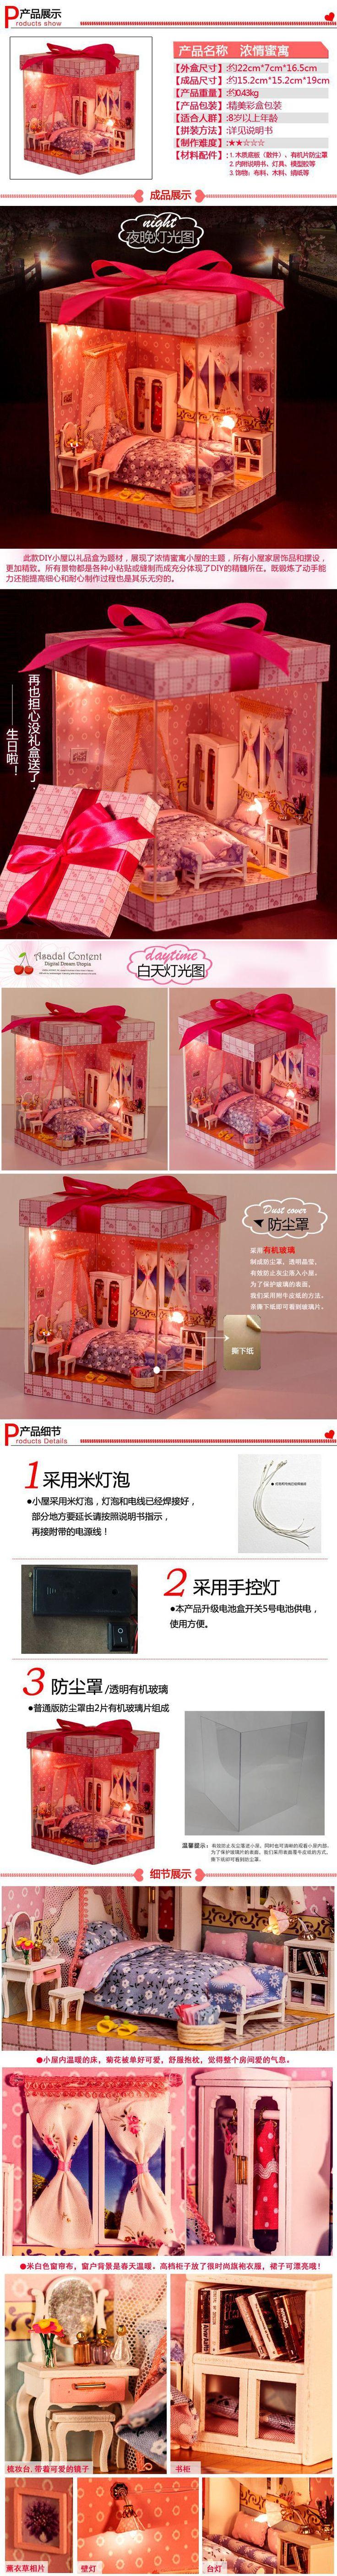 Creative birthday gift _ hut assembled model diy send his girlfriend birthday Valentine Hongda new passion Honey Apartments - Alibaba